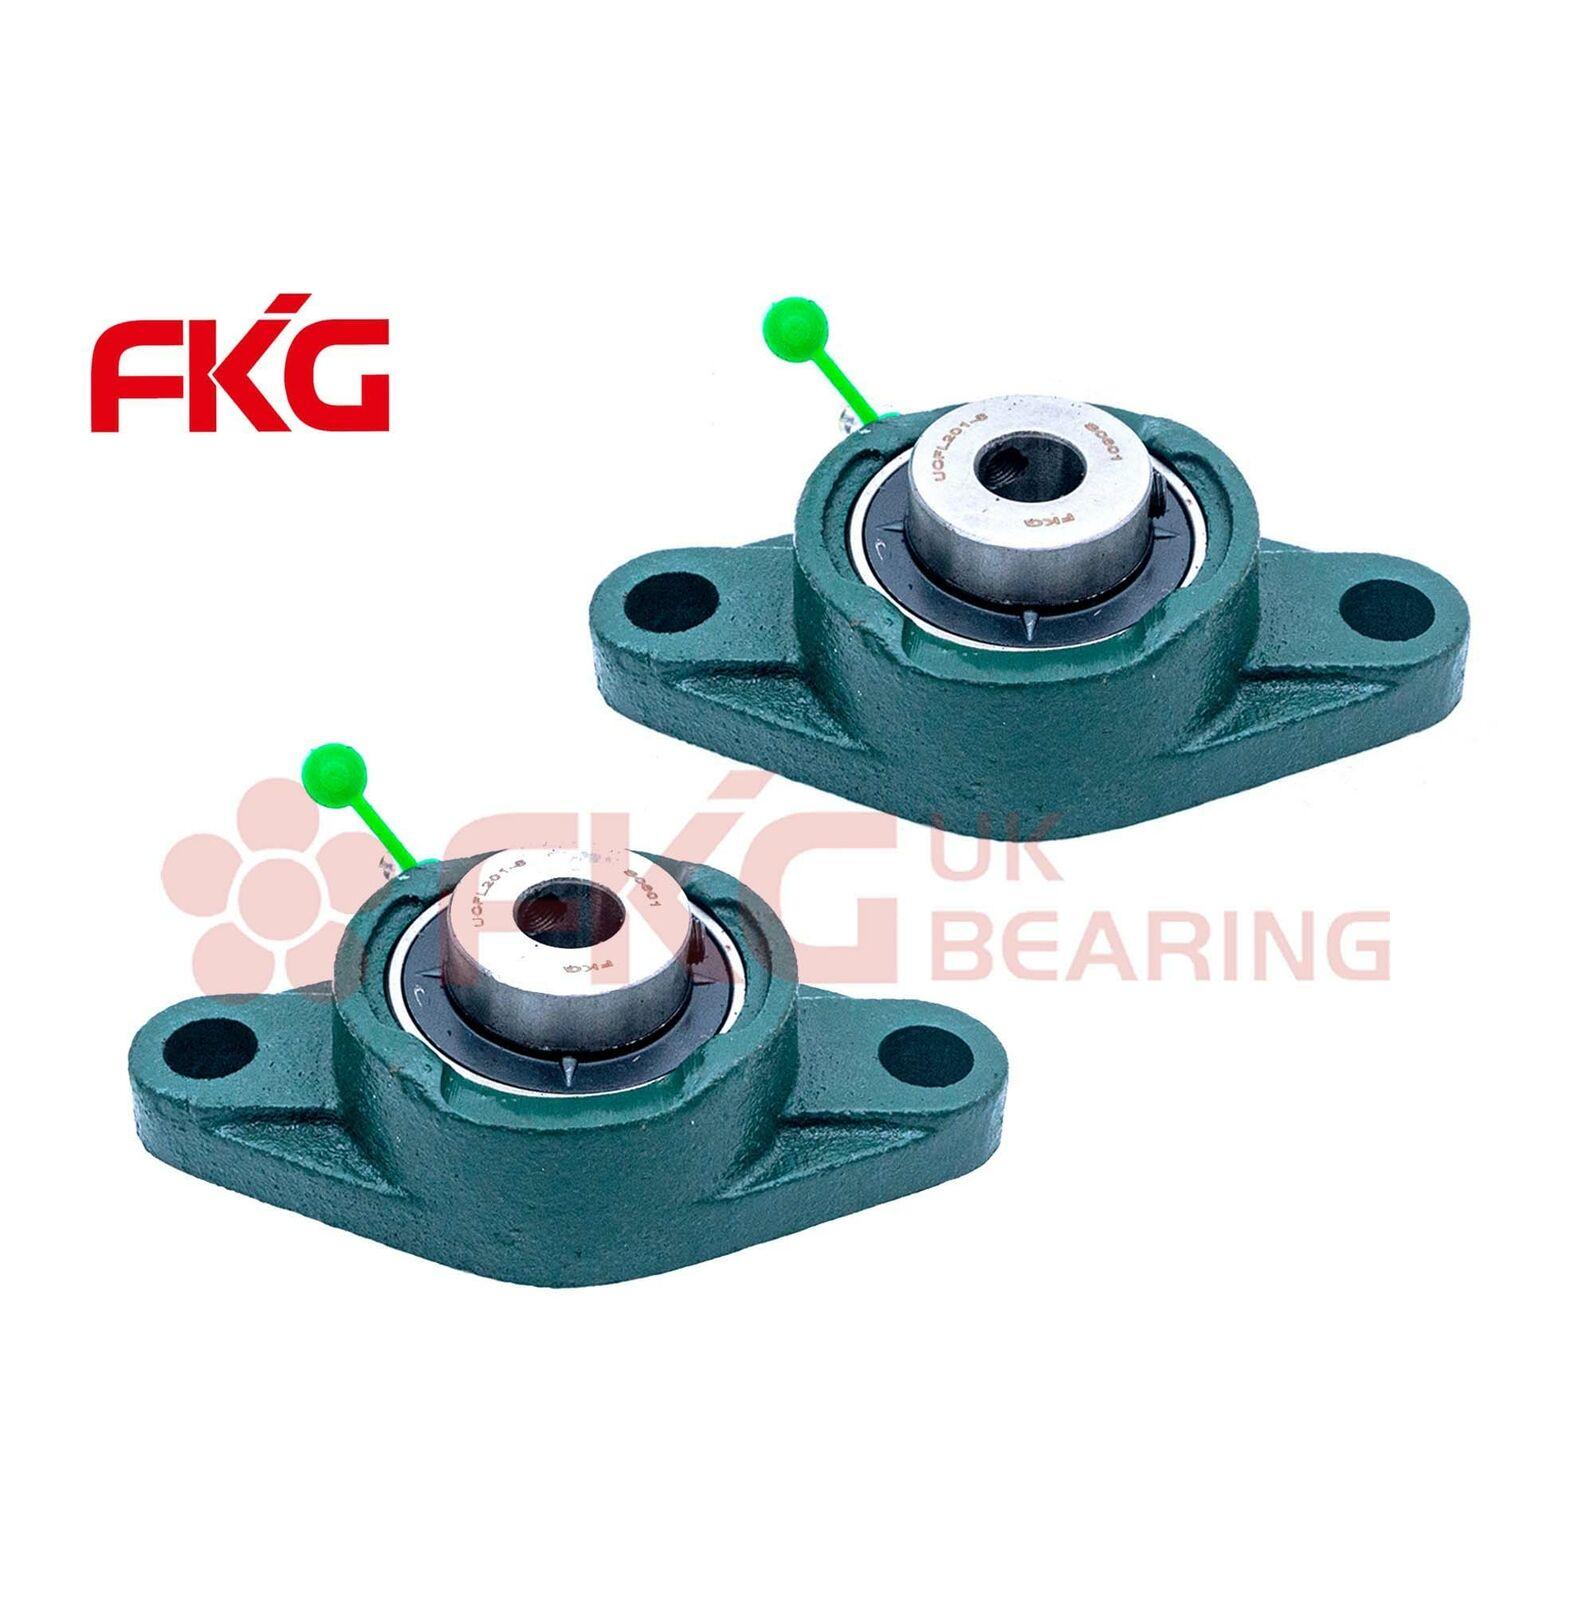 FKG UCFL202-10 Pillow Block Flange Bearing 5//8 inch Bore